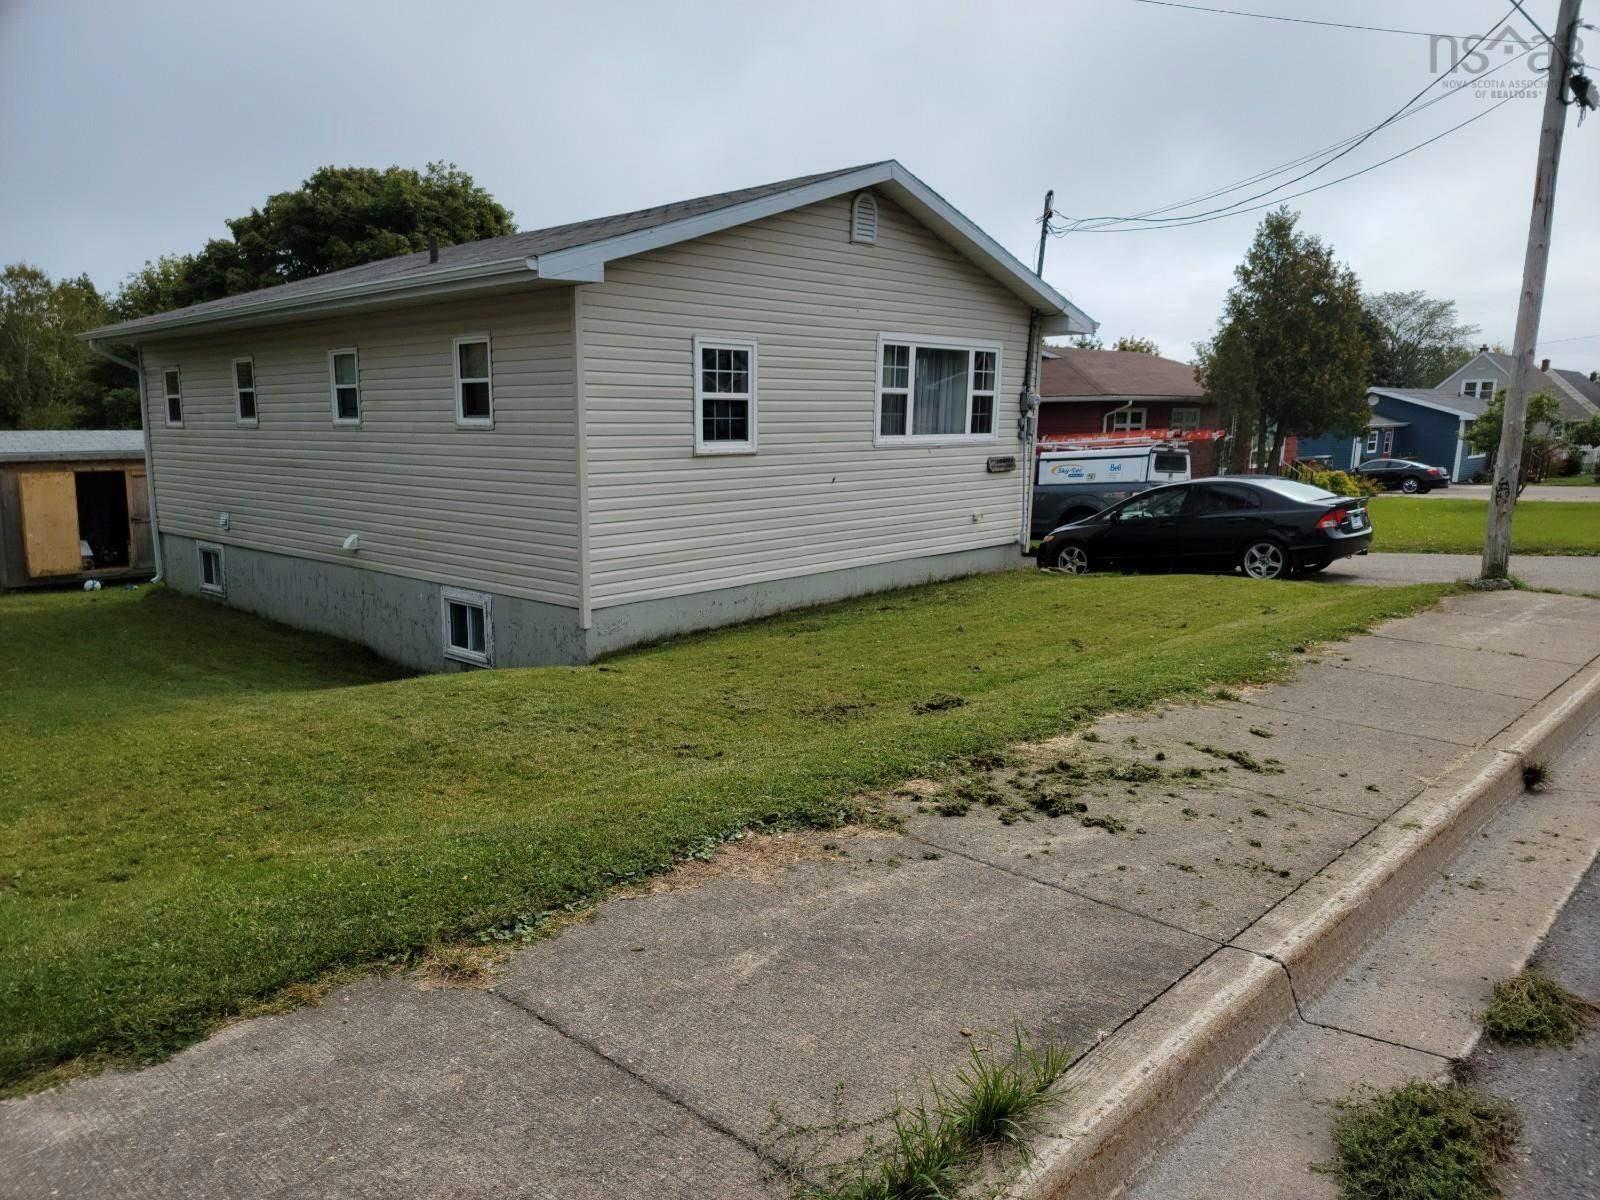 Main Photo: 29 Moulton Avenue in North Sydney: 205-North Sydney Residential for sale (Cape Breton)  : MLS®# 202124541